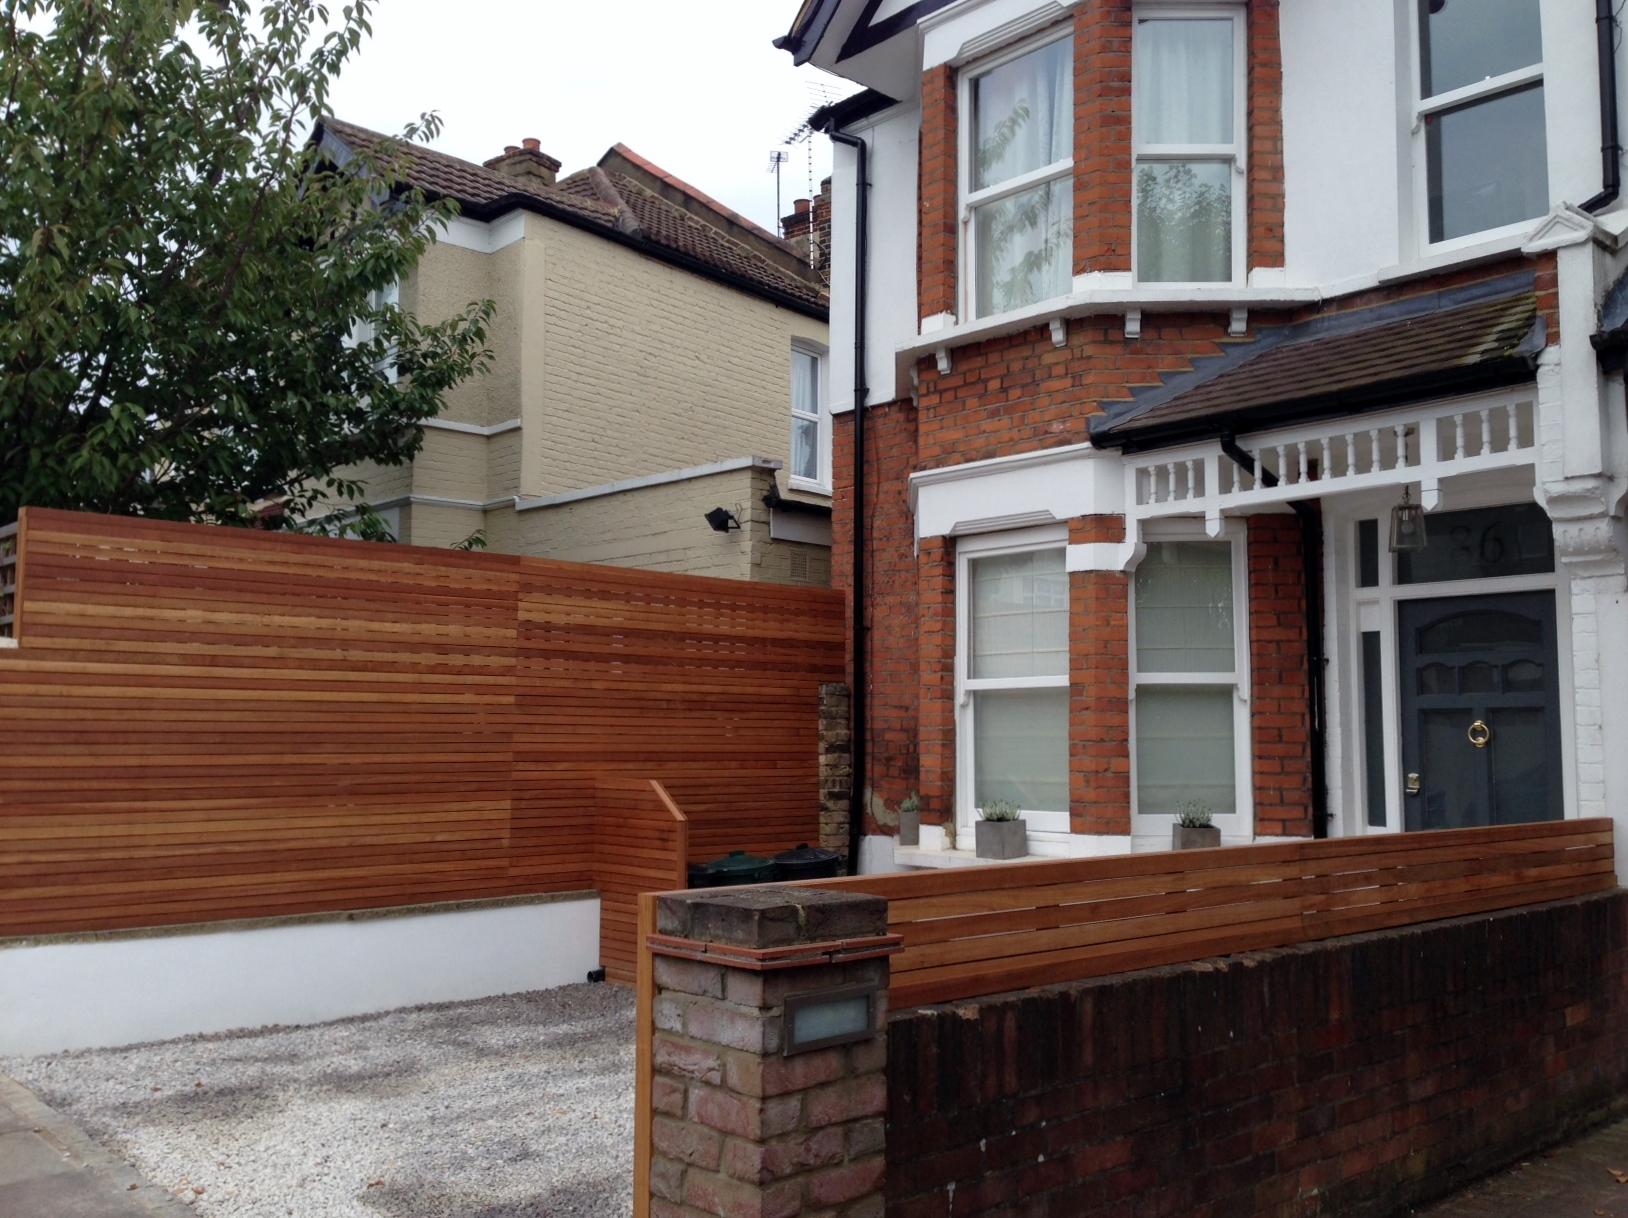 front garden drivewat gravel travertine paving path hardwood privacy screen trellis tooting london (15)